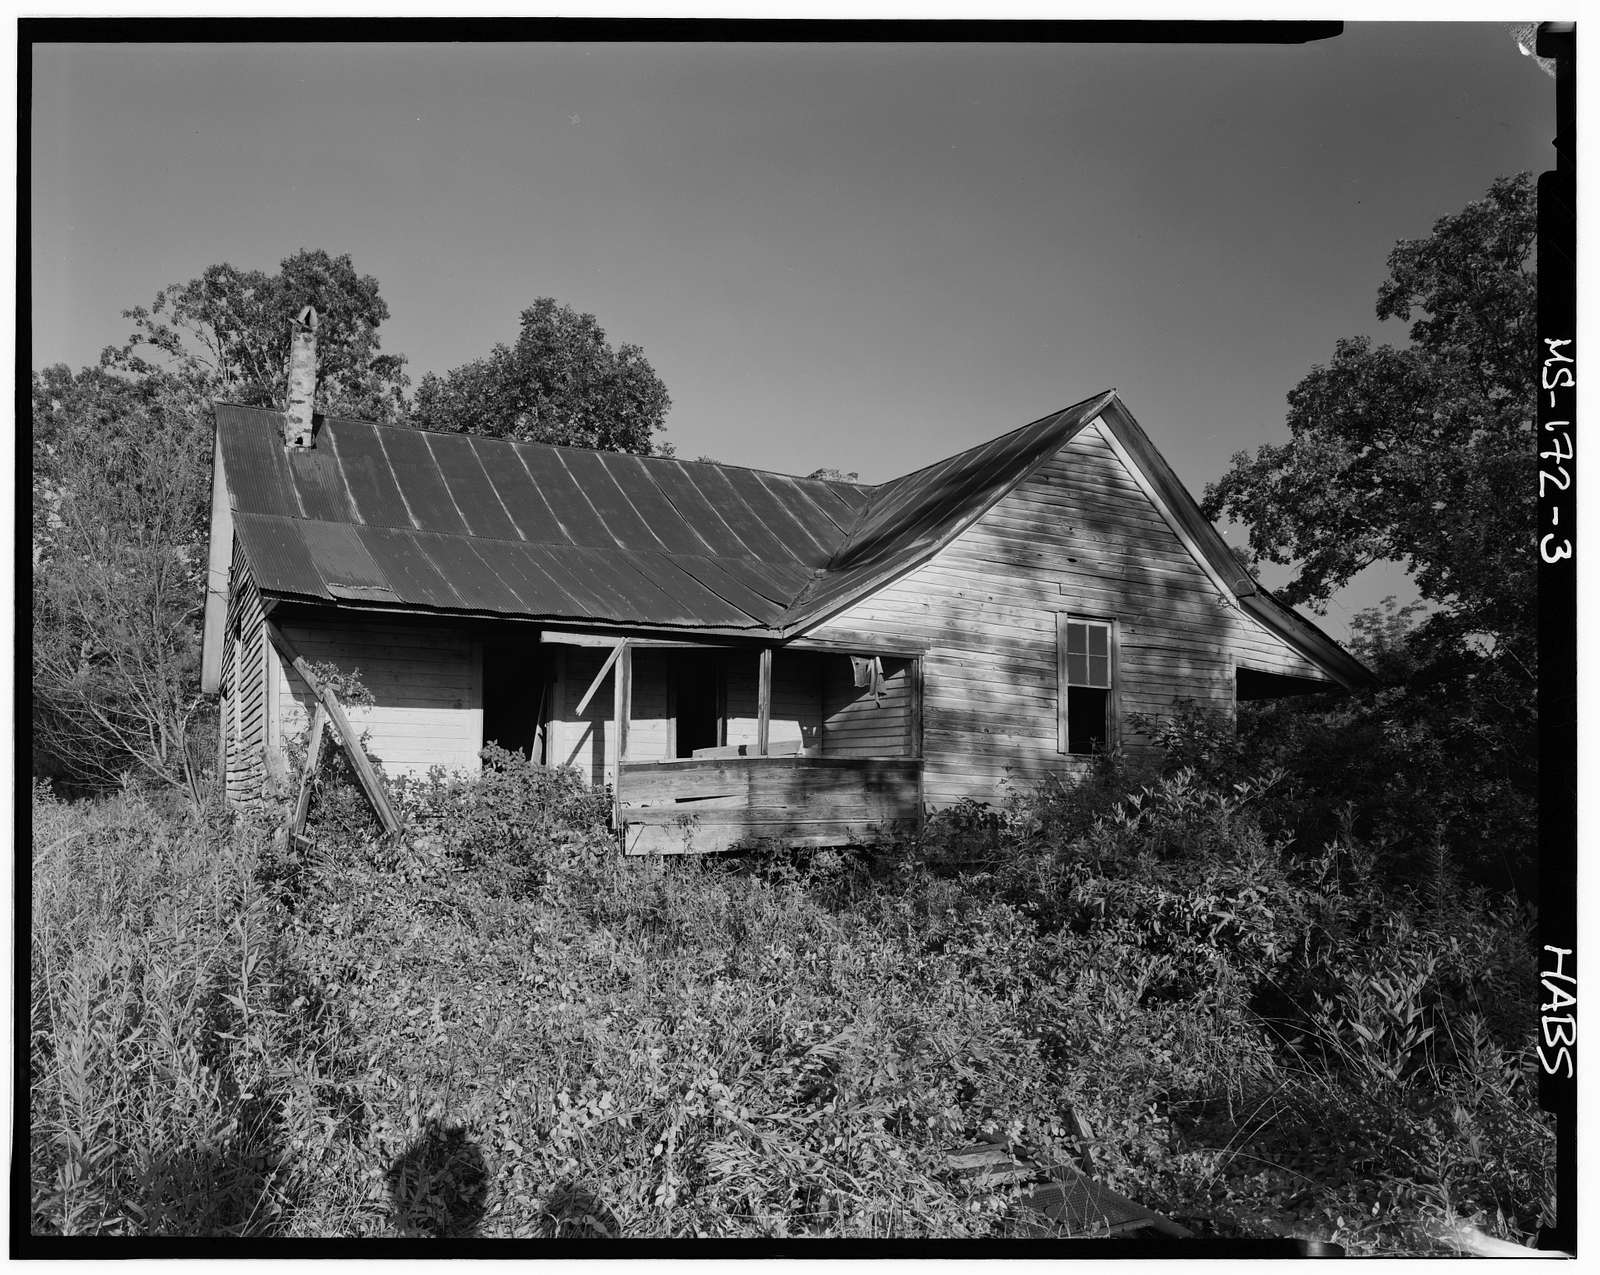 Ezra Searcy House, West of Prentiss-Tishimingo County Line, New Site, Prentiss County, MS